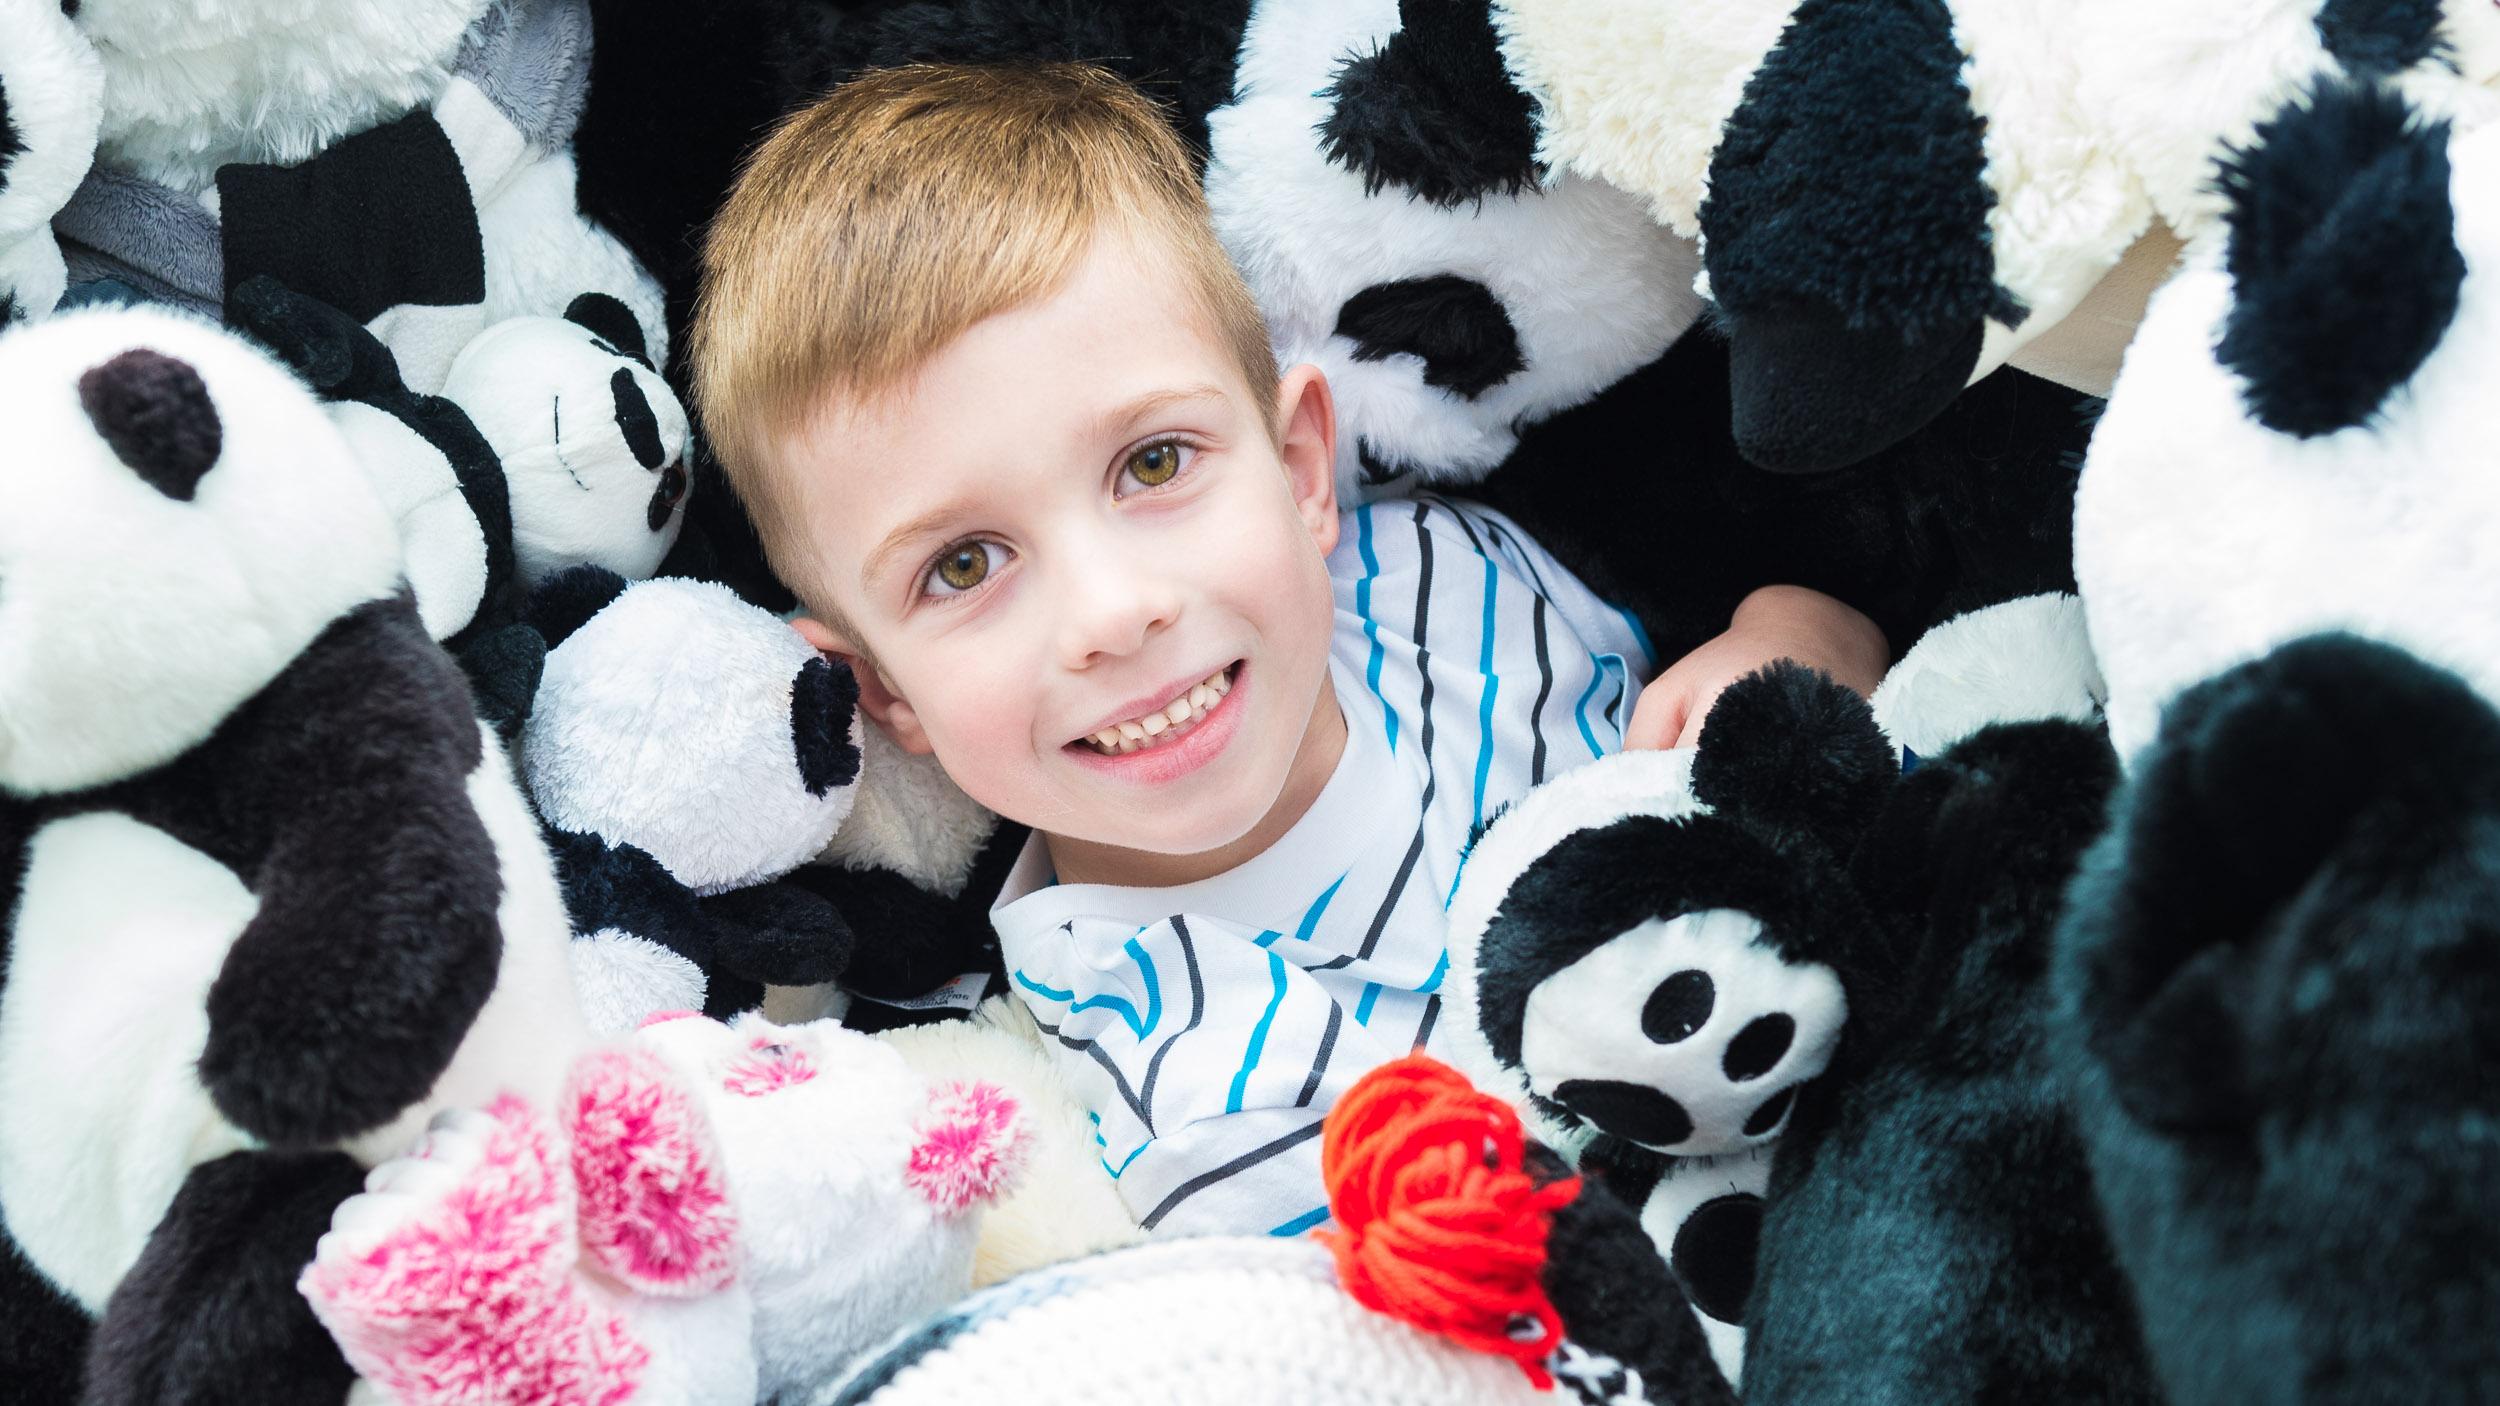 Little-boy-with-stuffed-panda-toys.jpg